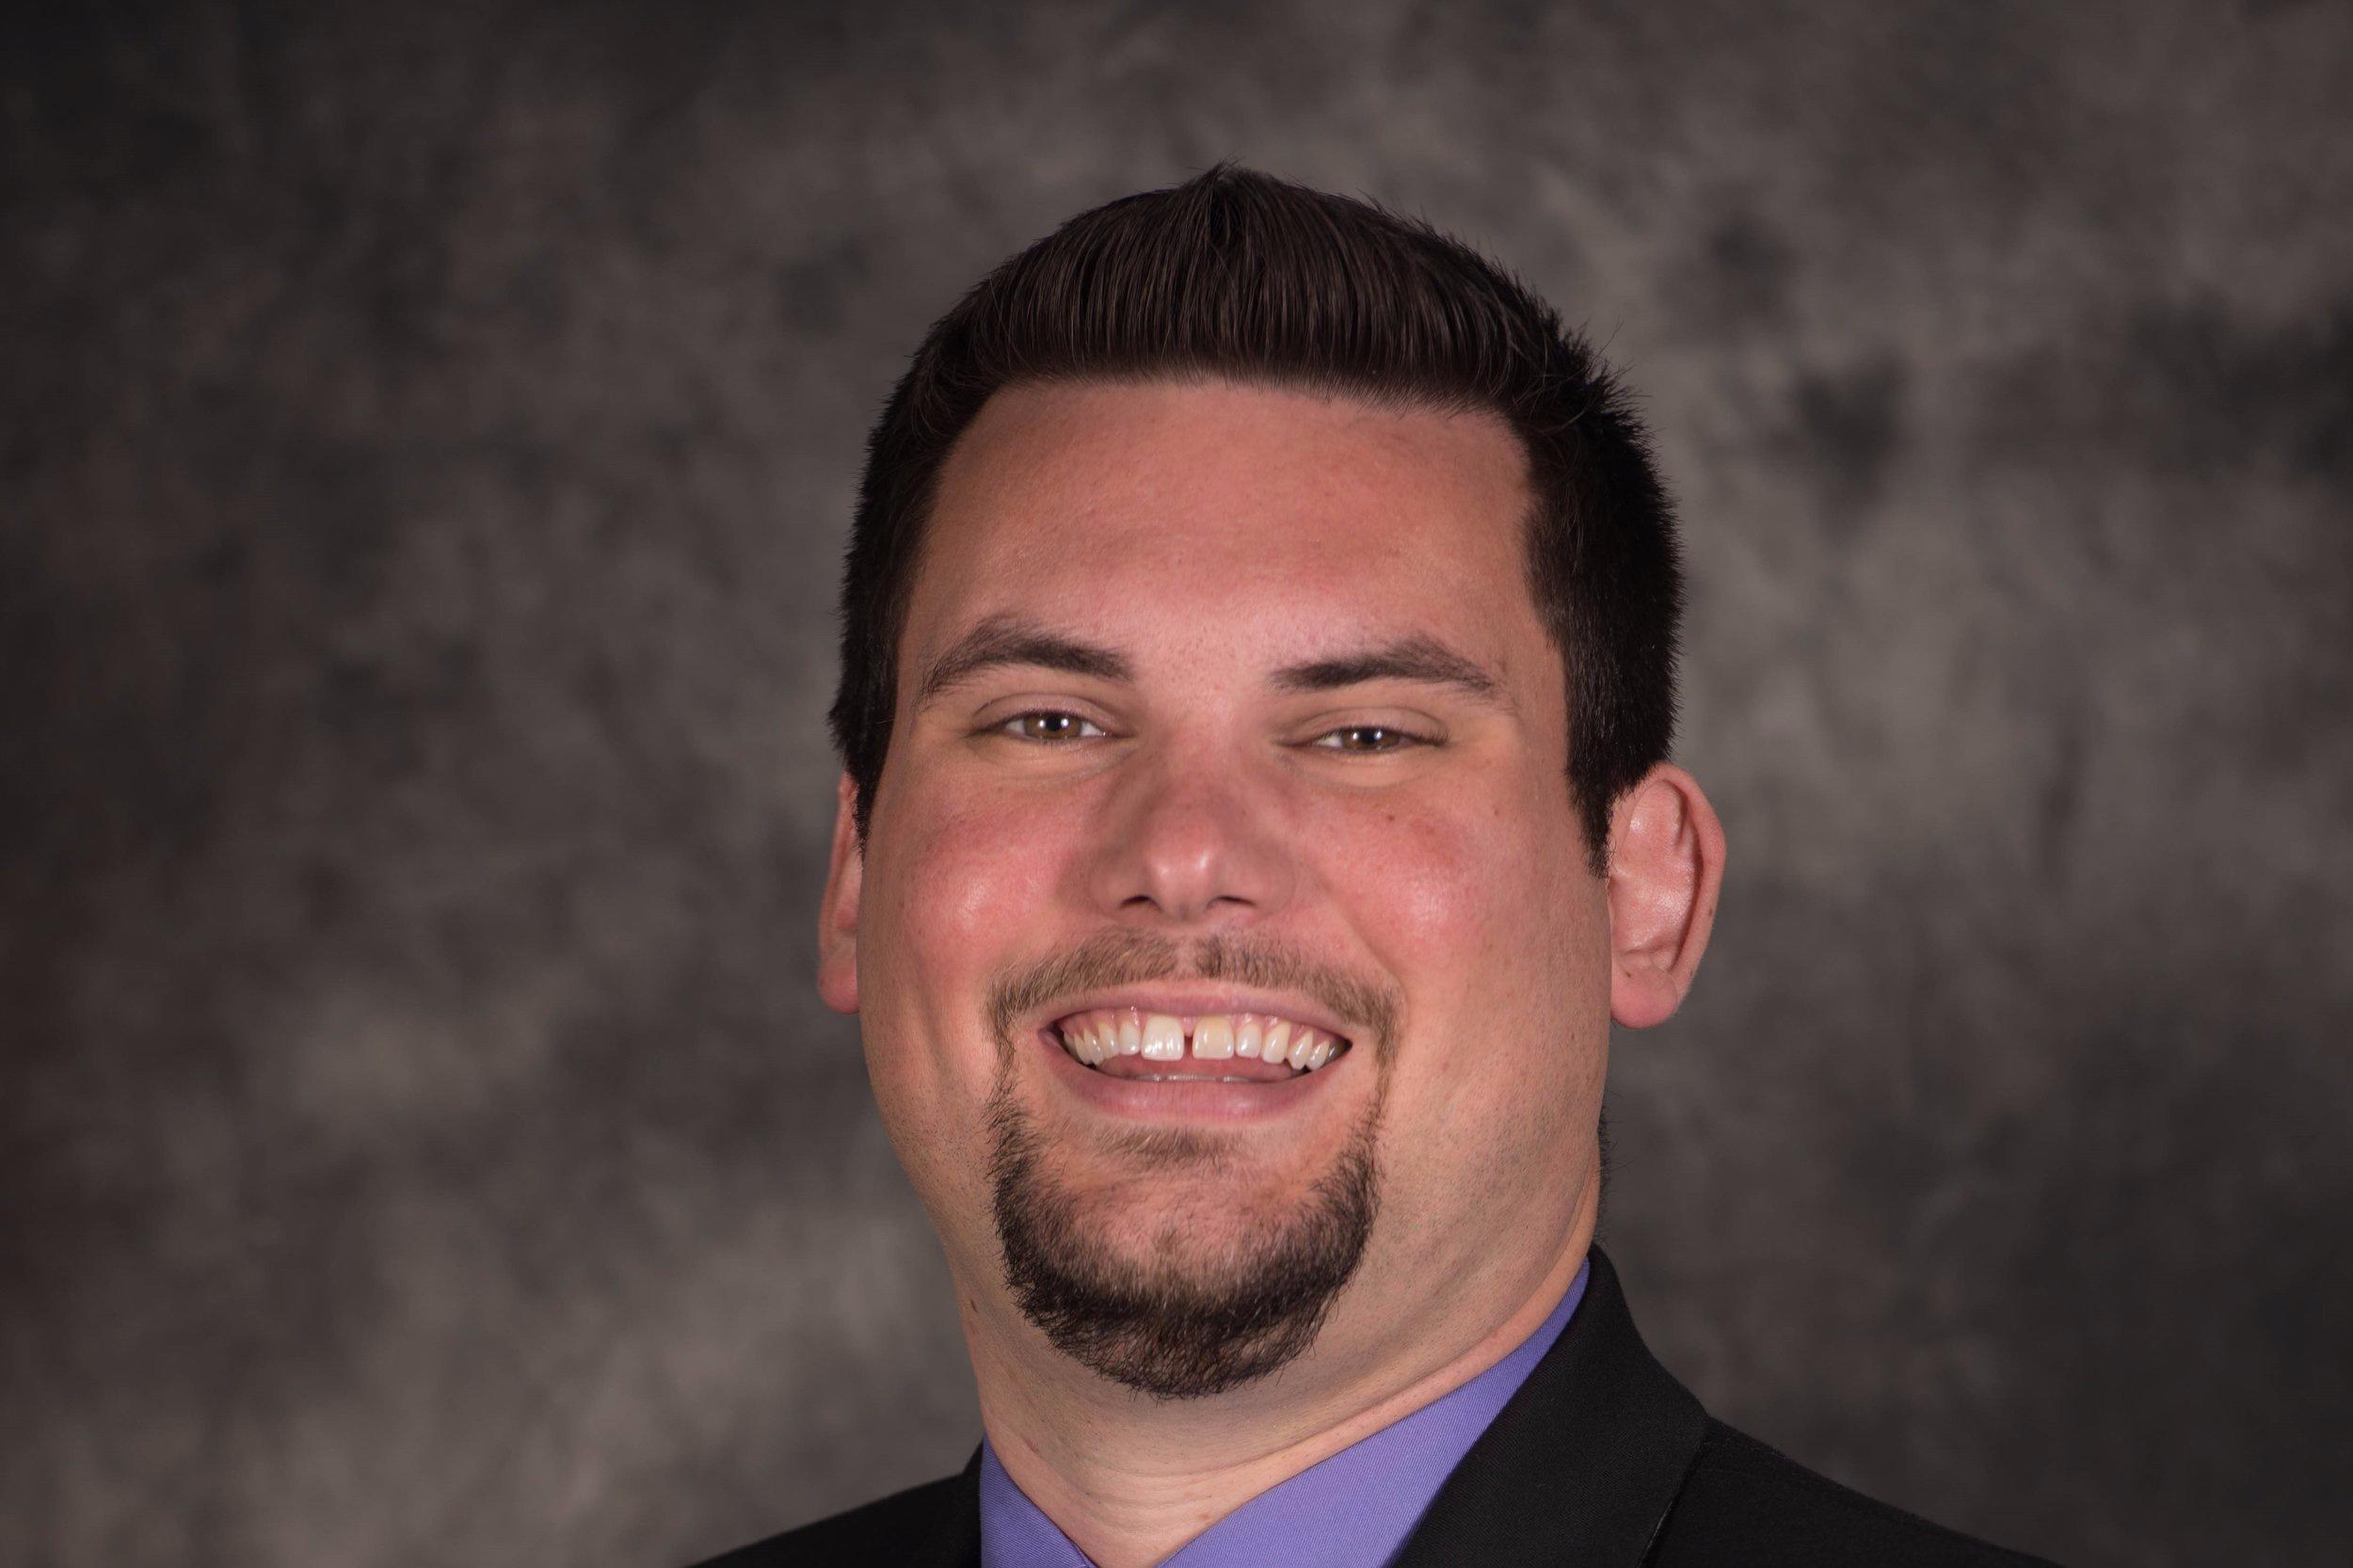 Eric Hunt - Myrtle Beach Wedding OfficiantAmbassador of the Month